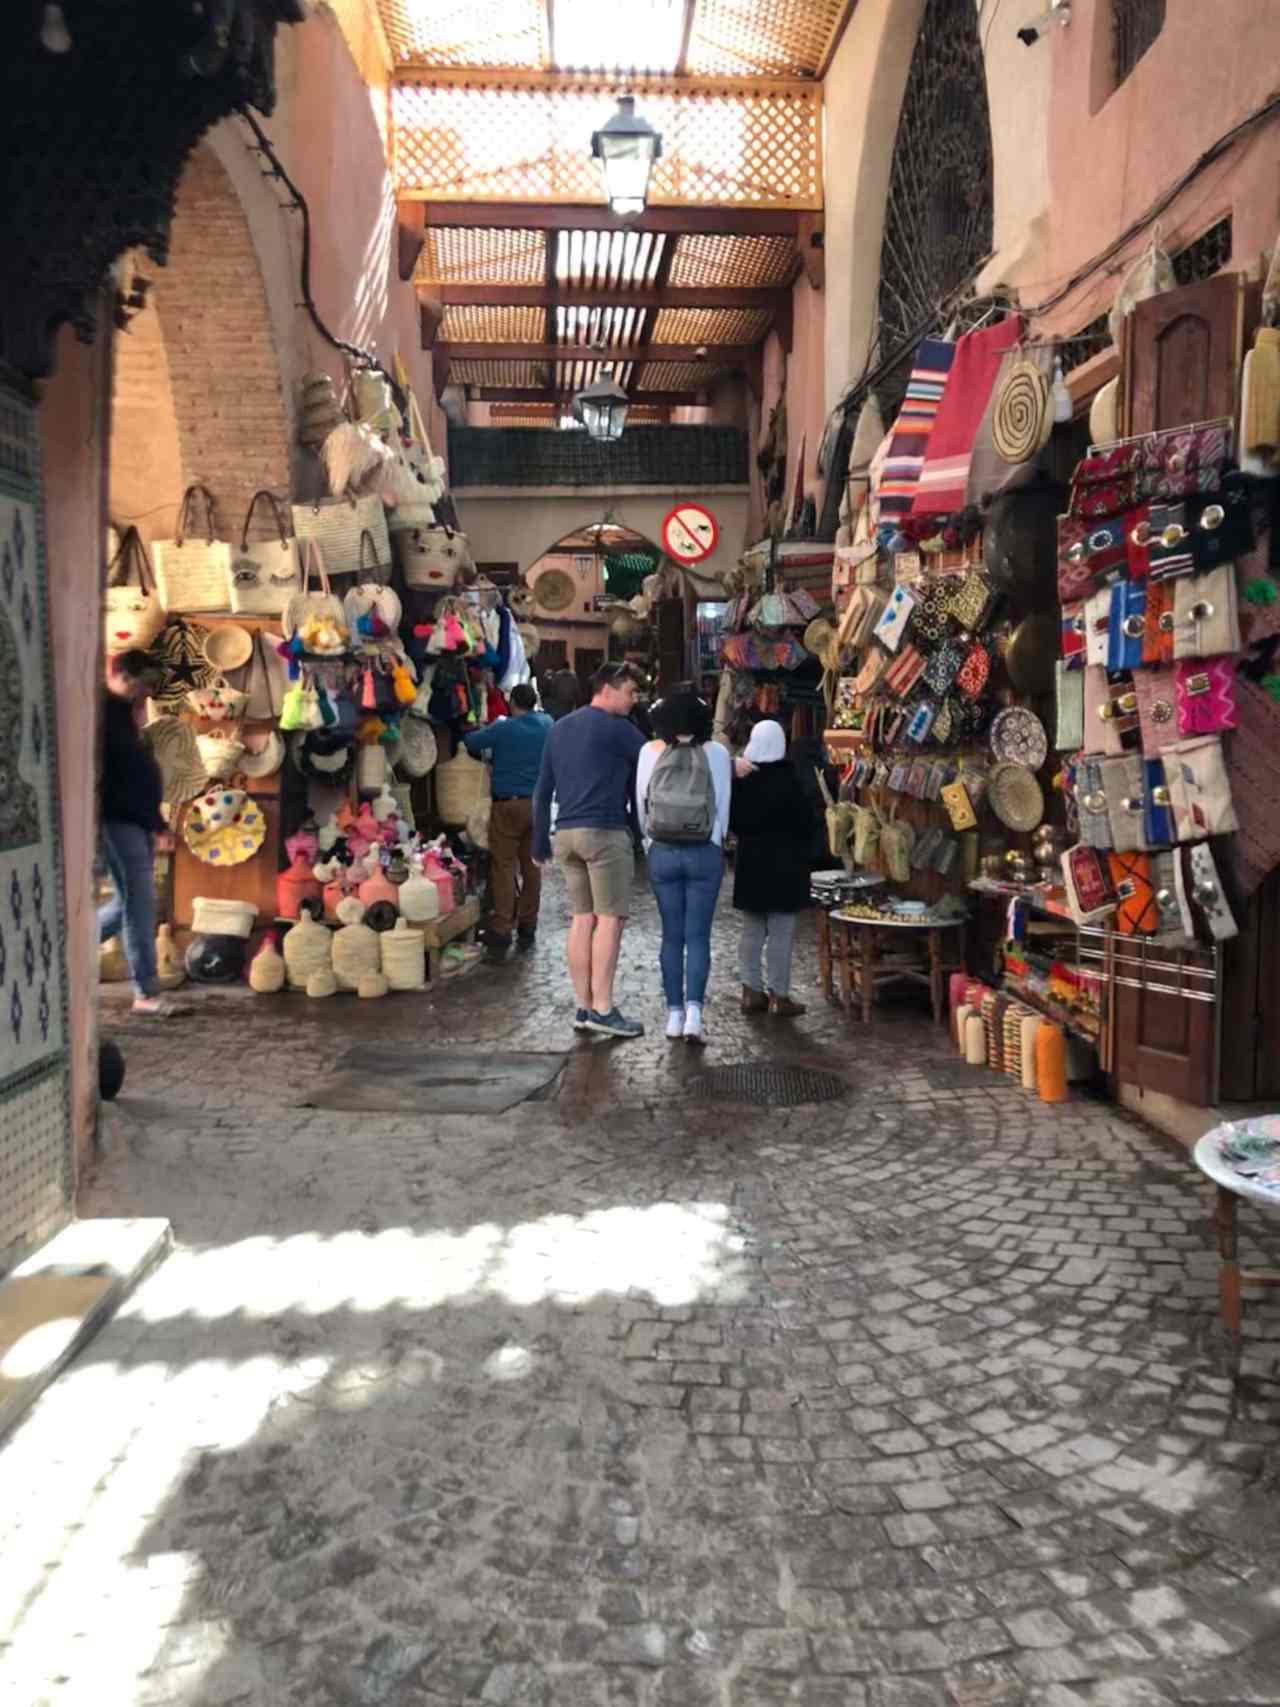 Morning in the Marrakech souks